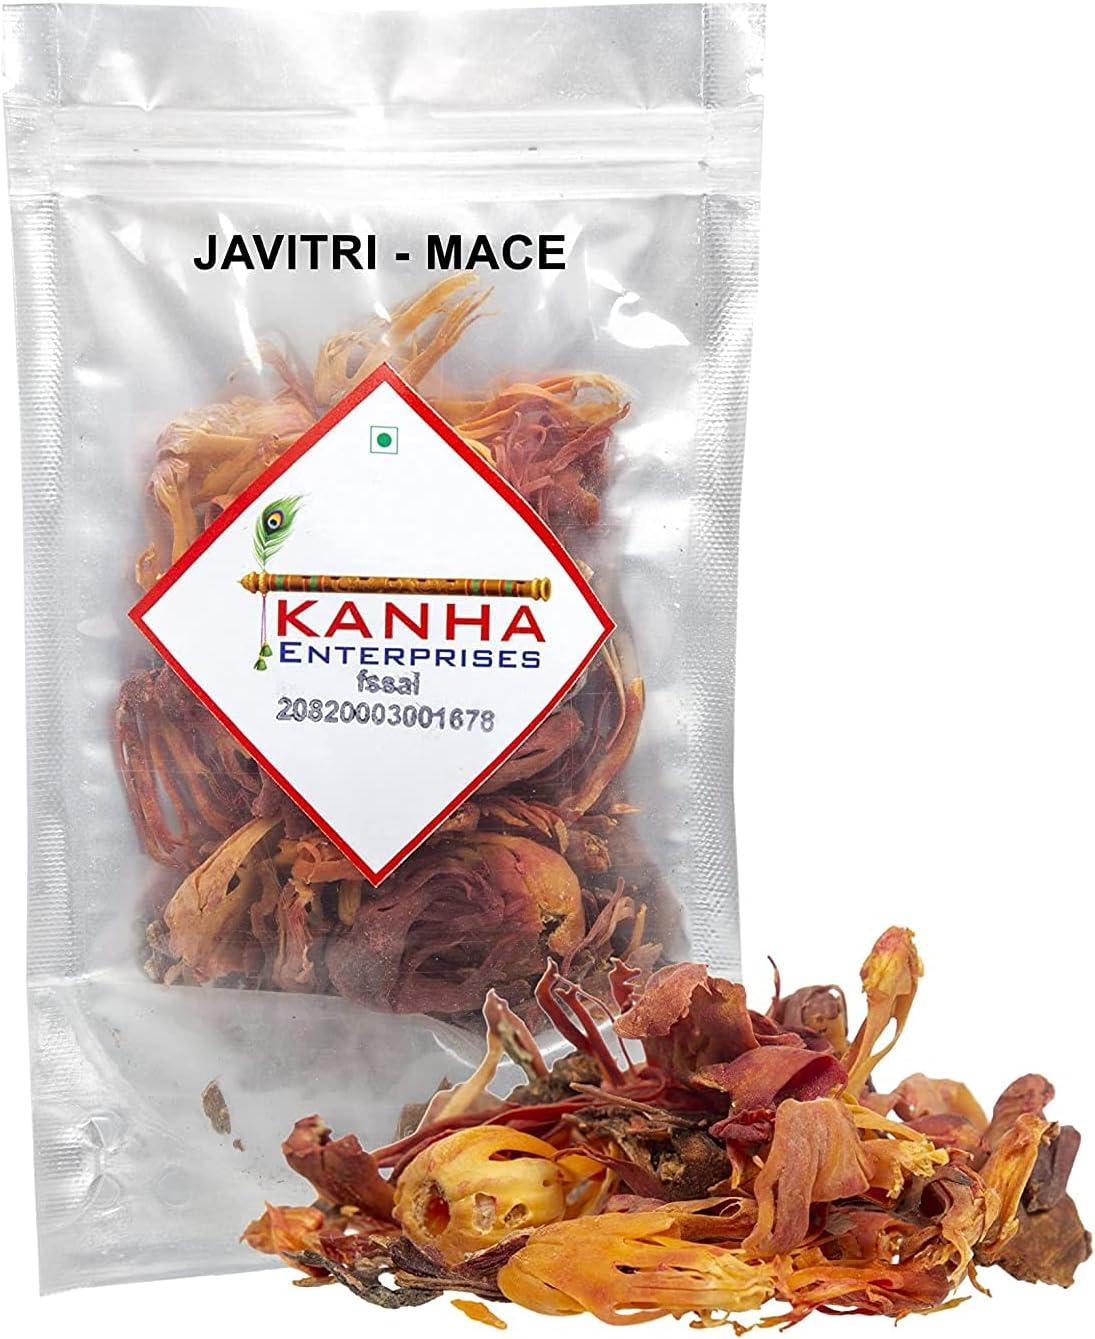 Carlos Kanha Enterprises Natural Farm Whole Fresh Javitri San Antonio Mall Cash special price Mace B